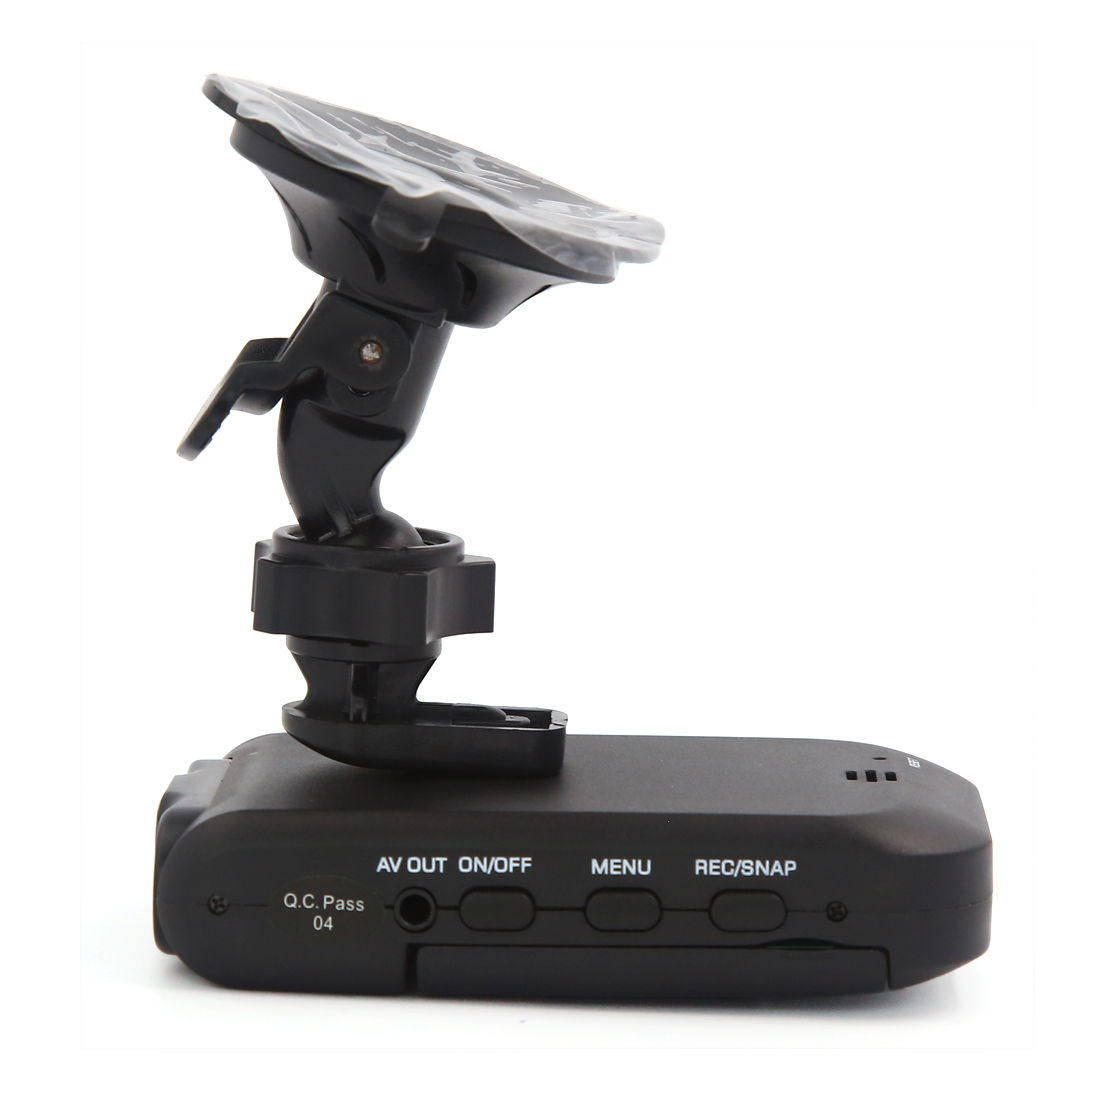 "Portable Black Plastic 2.5"" TFT Screen Auto Car Video Recorder DVR Night Vision - image 1 of 5"